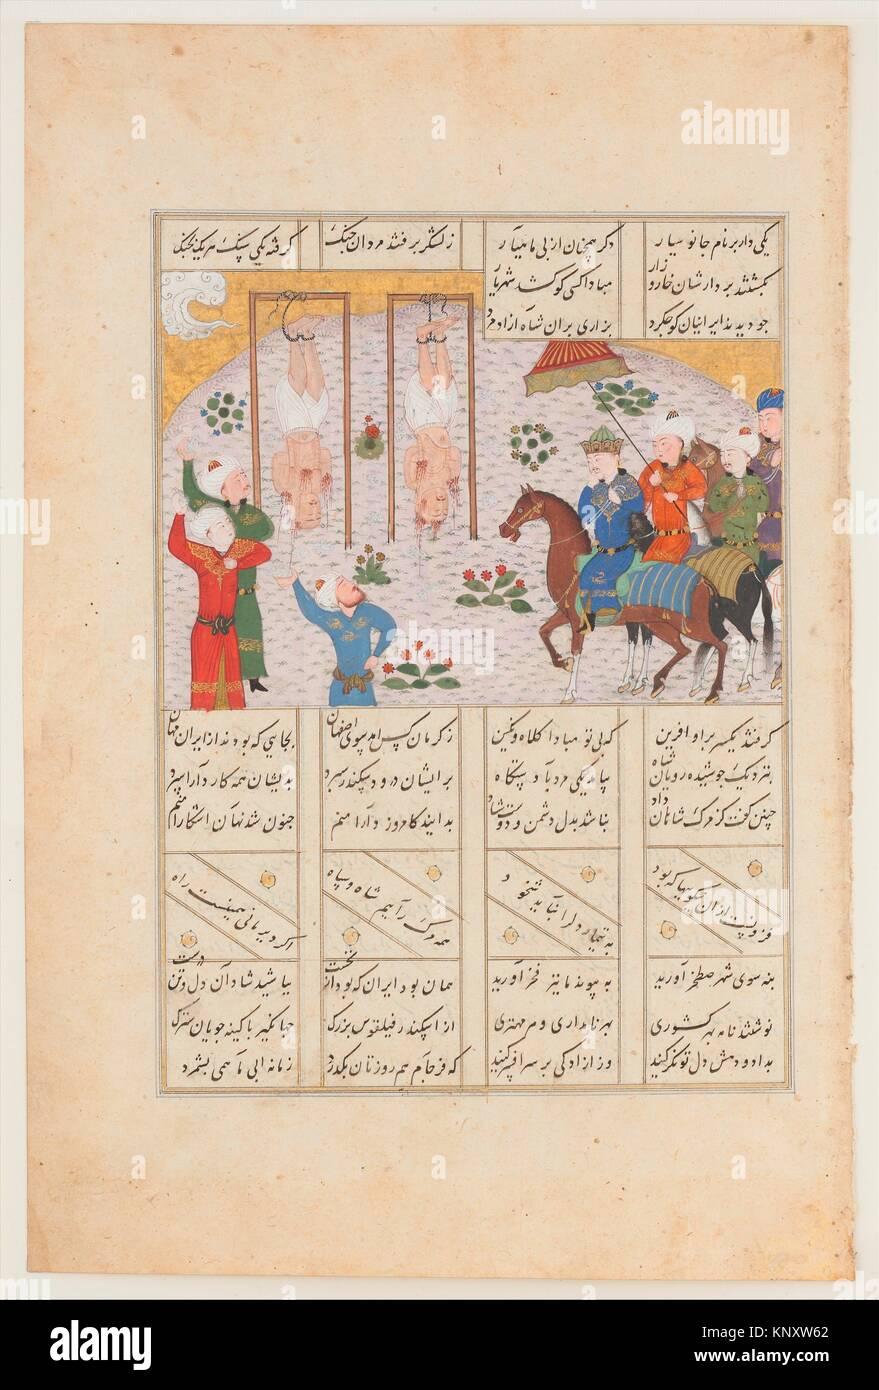 Alexander Executes Janusiyar and Mahiyar, the Slayers of Darius, Folio from a Shahnama (Book of Kings) of Firdausi. - Stock Image